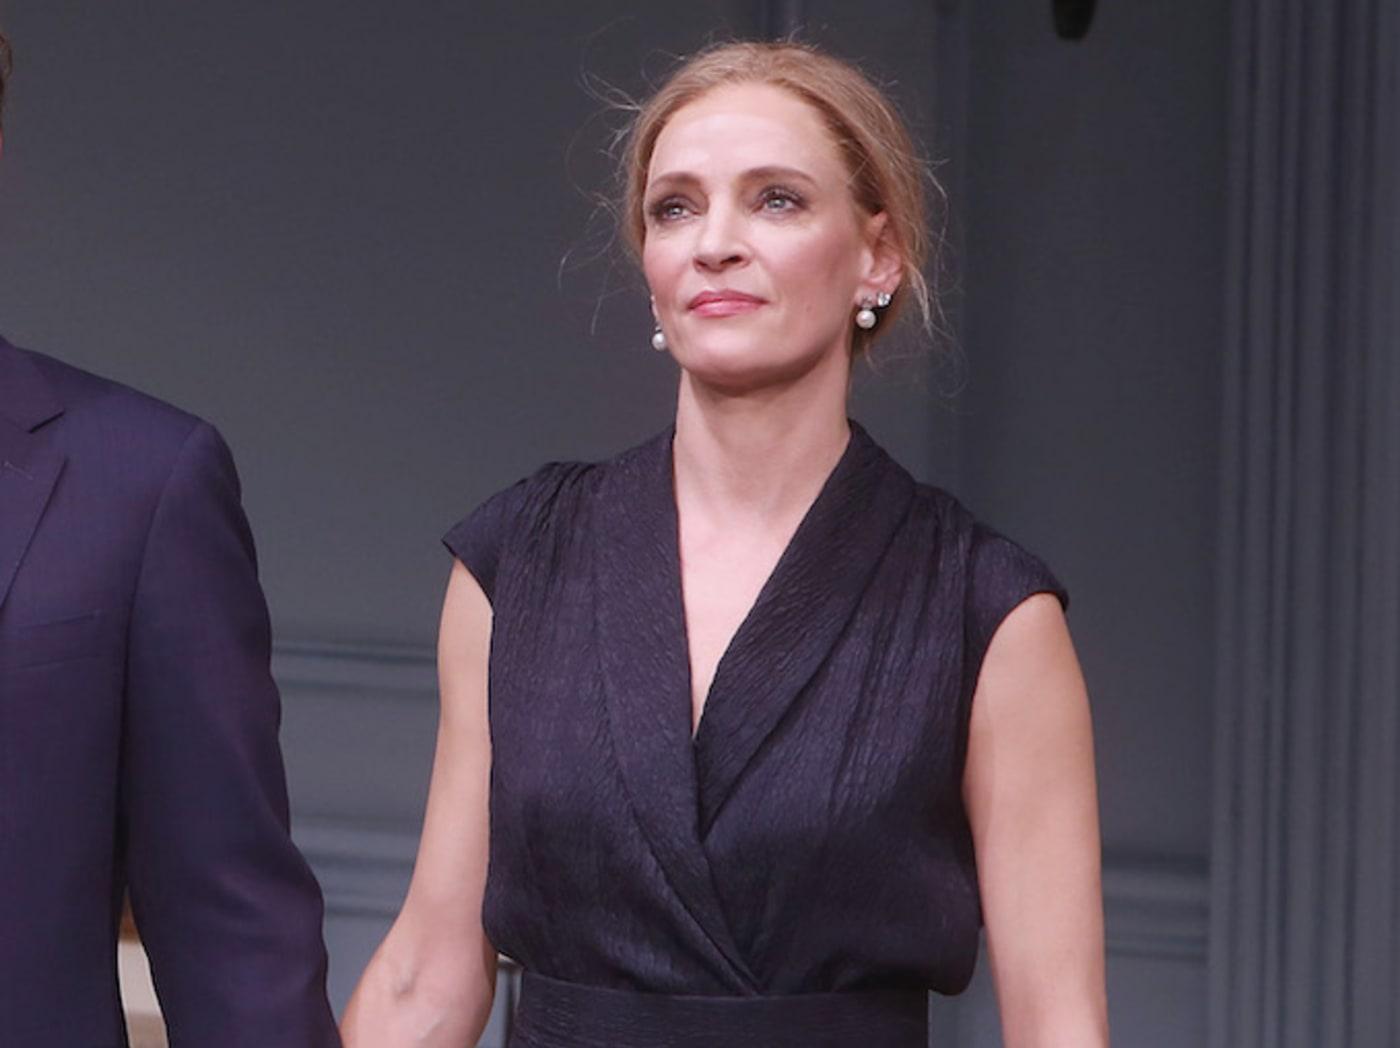 Uma Thurman at the Opening Night curtain call for 'The Parisian Woman.'